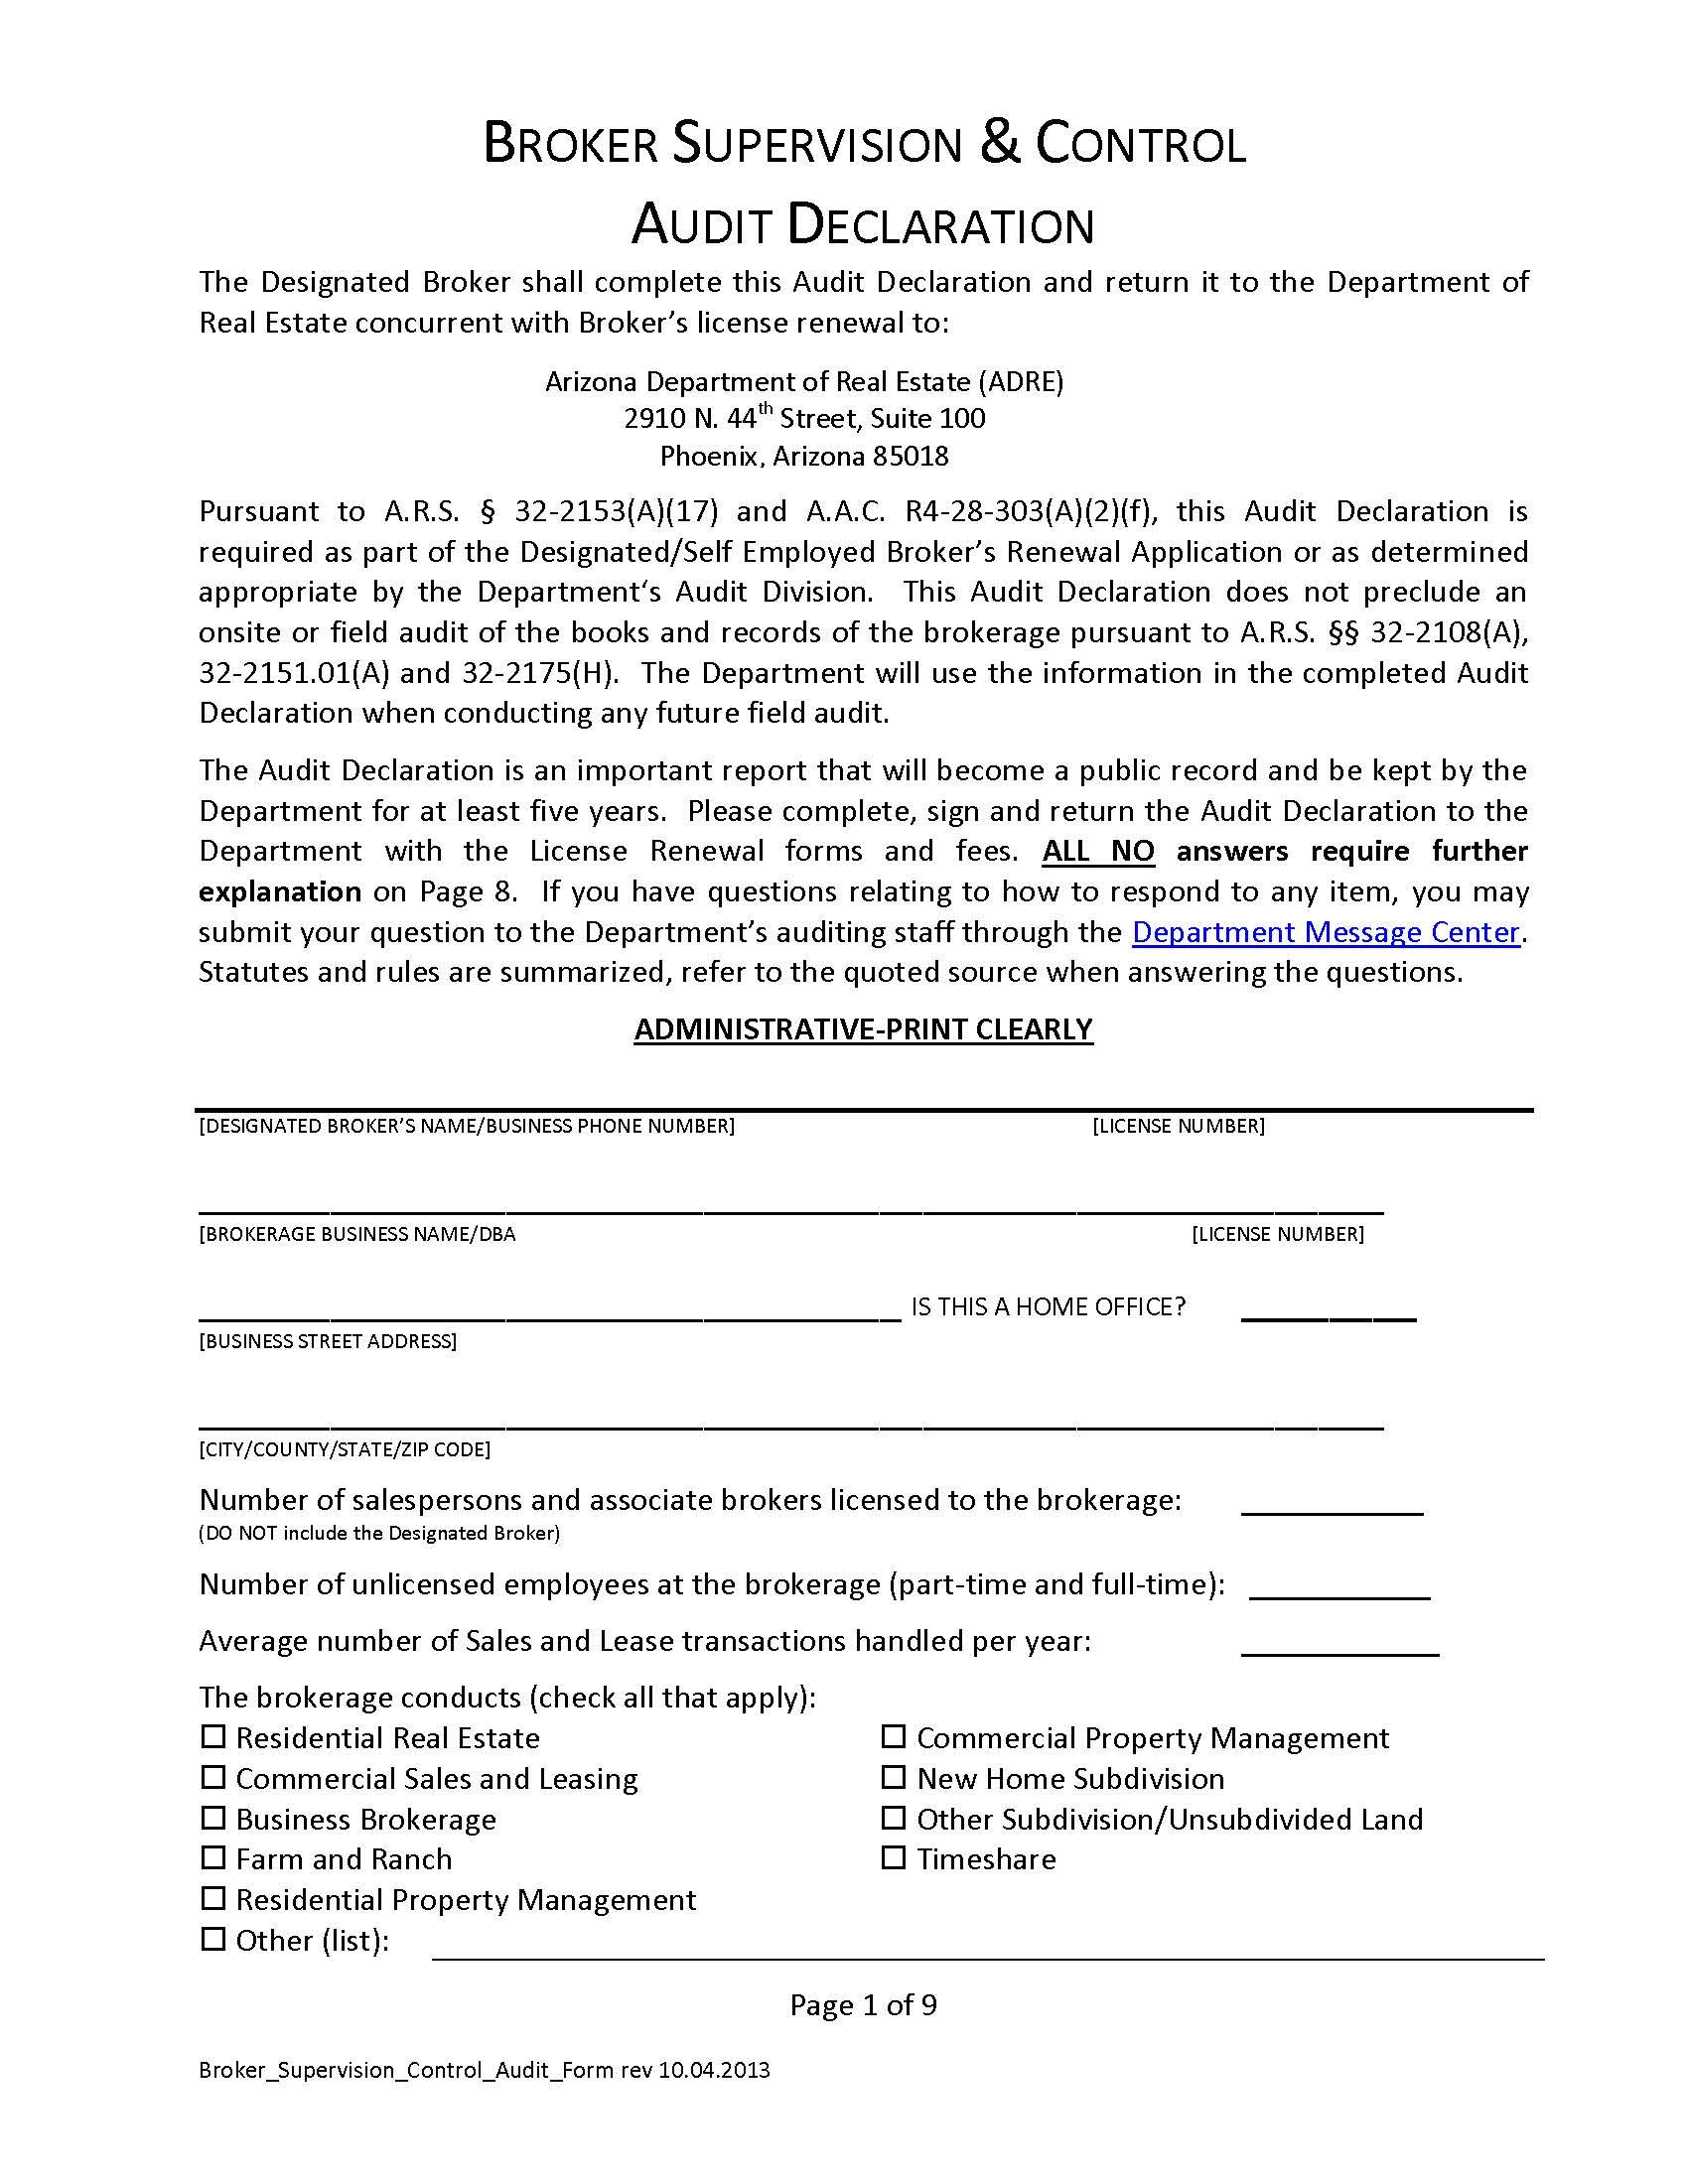 Broker_Supervision_Control_Audit_Form.unlocked_Page_1